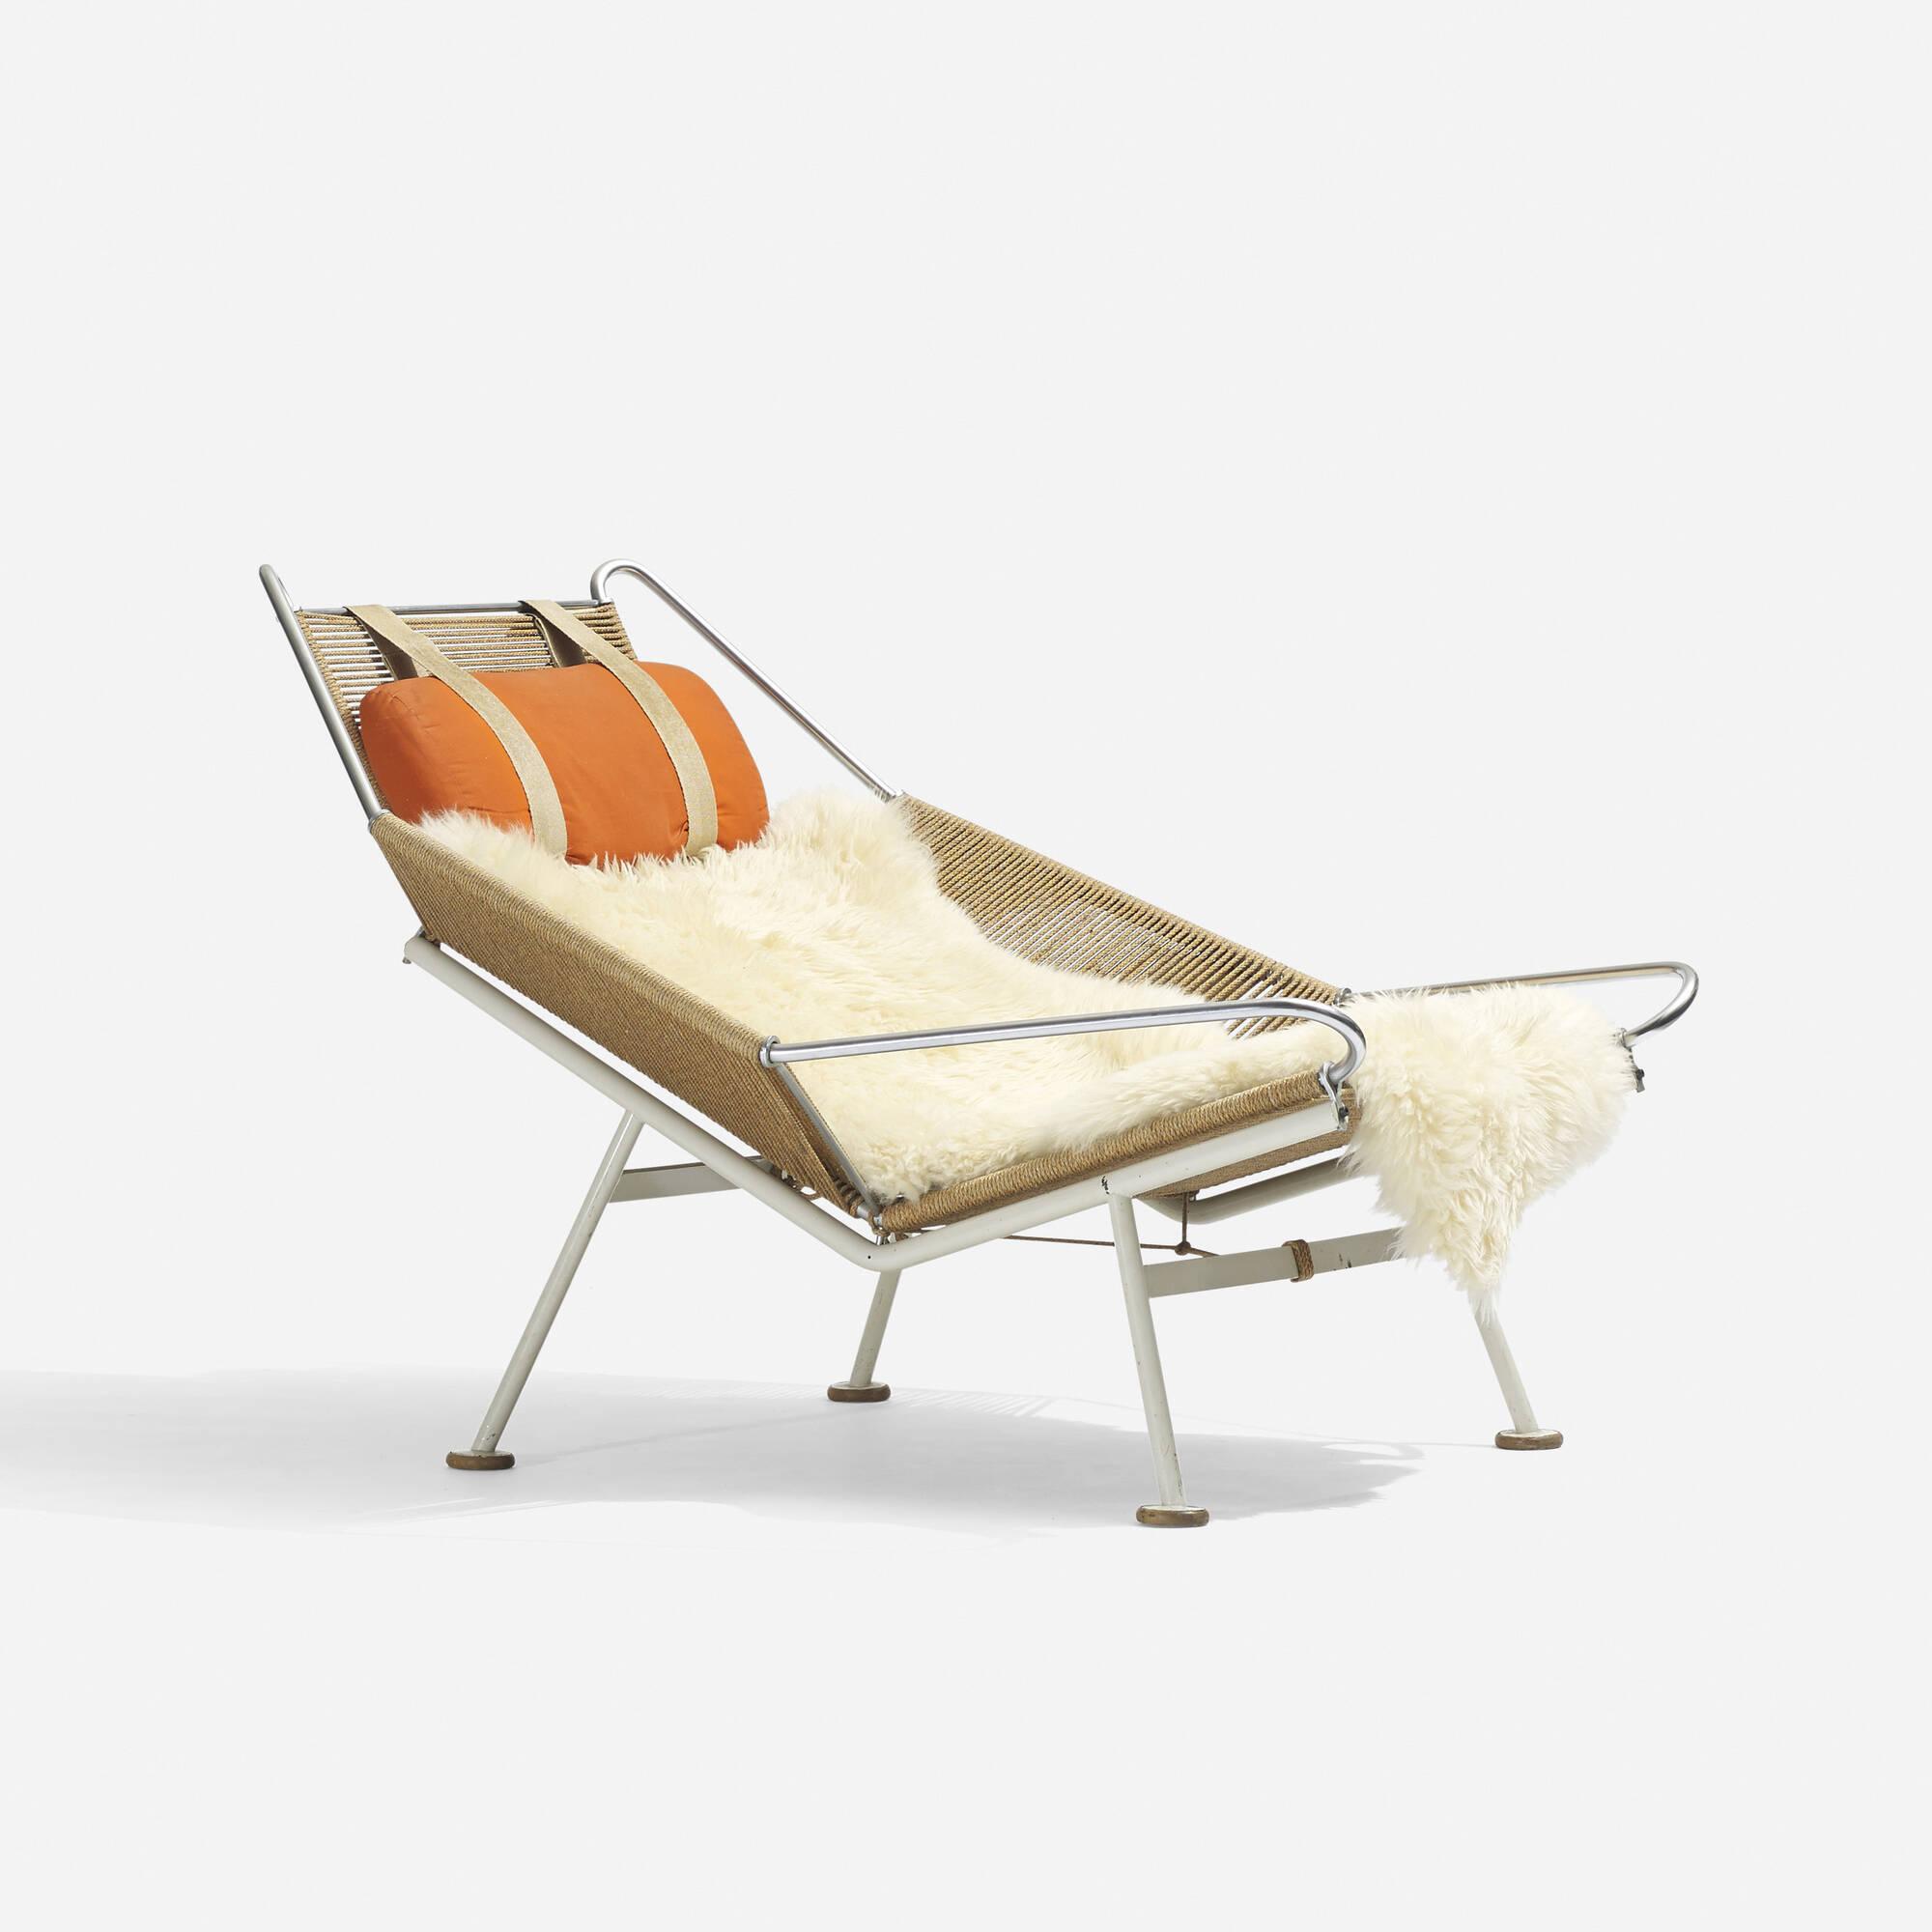 182: HANS J. WEGNER, Flag Halyard lounge chair